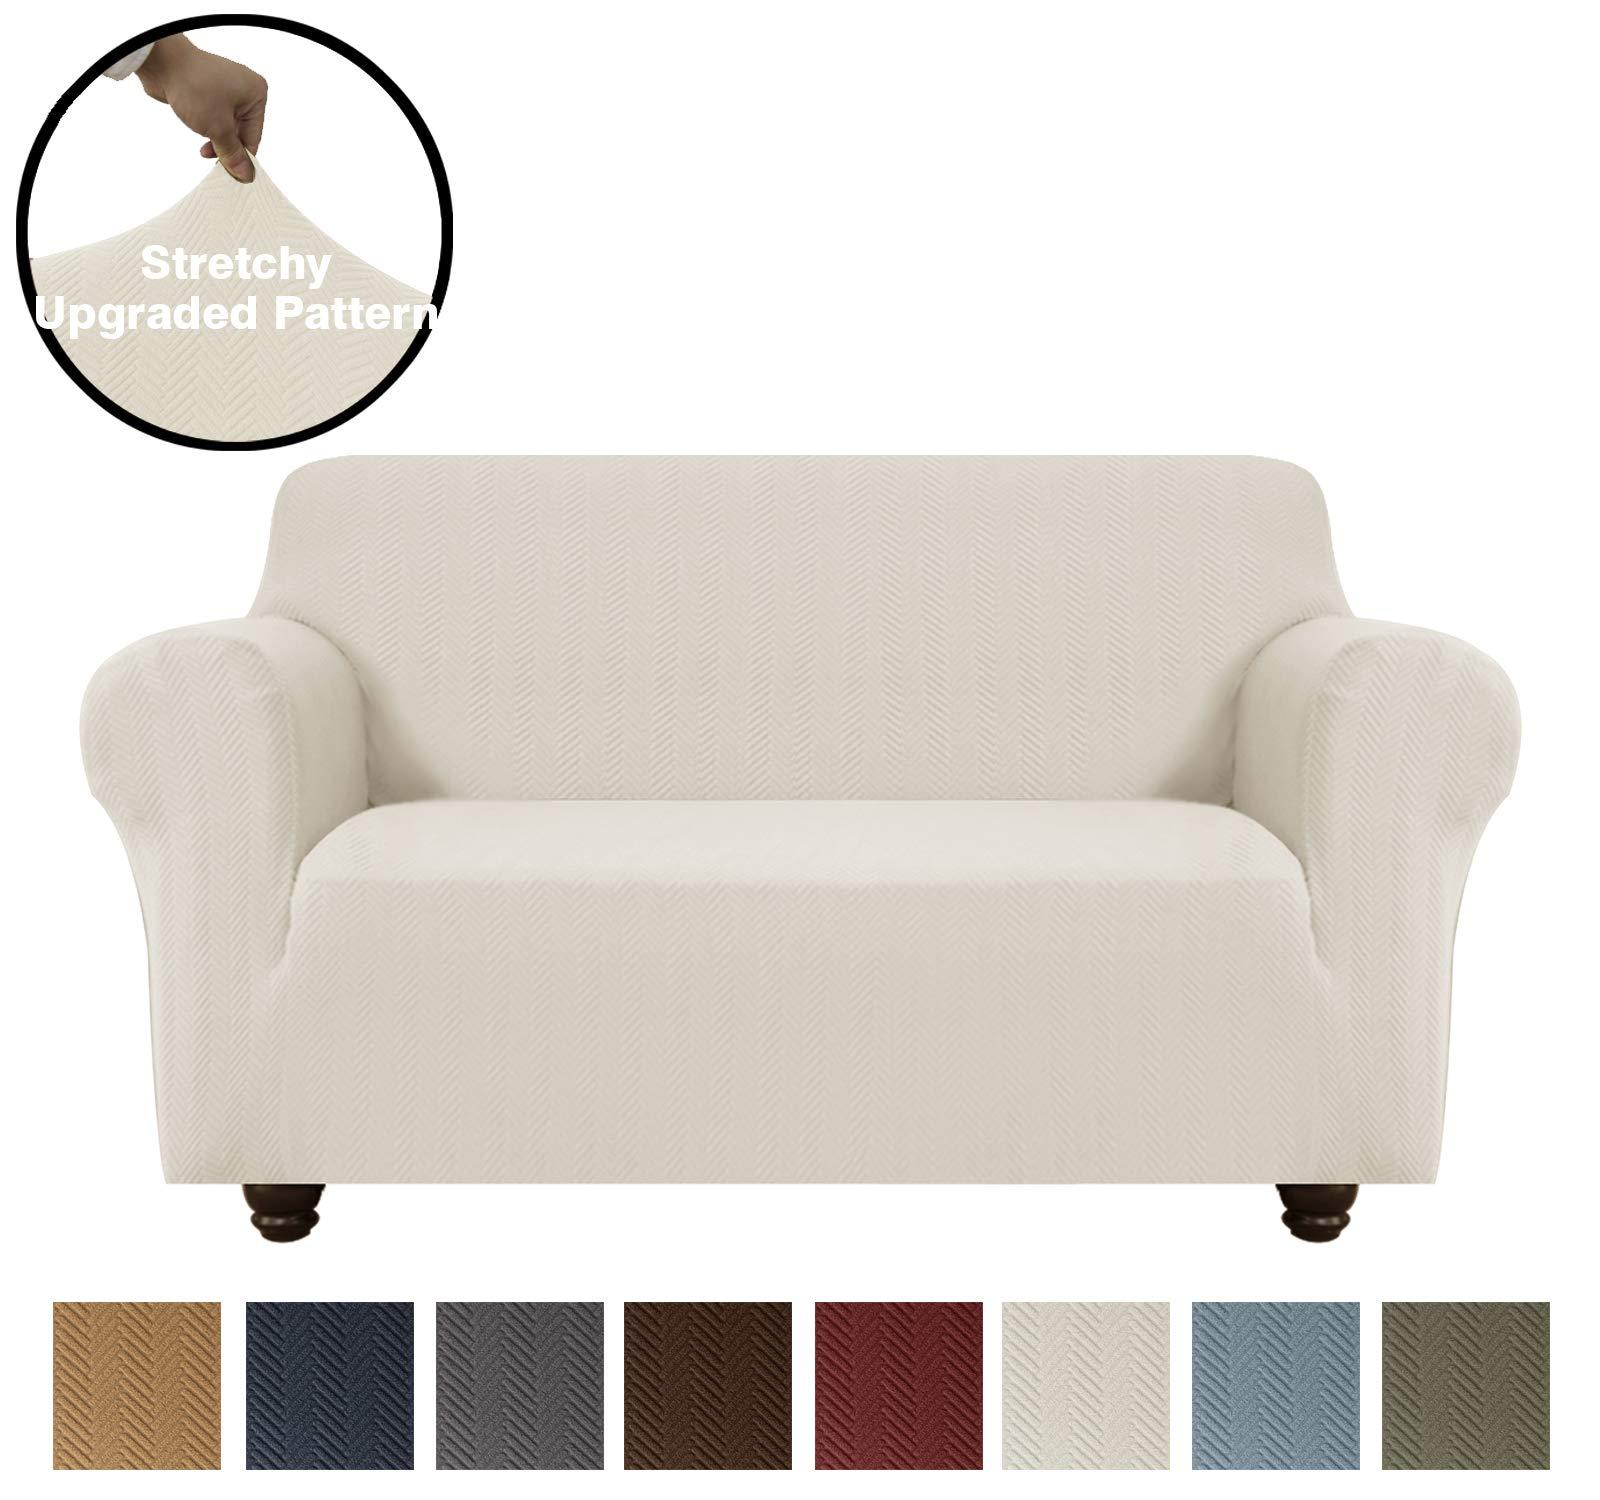 OBYTEX Stretch Sofa Slipcover Furniture Protectors Spandex Upgrade Pattern Jacquard Fabric Couch Covers Dog Cat Pet, Machine Washable (Medium, Cream)